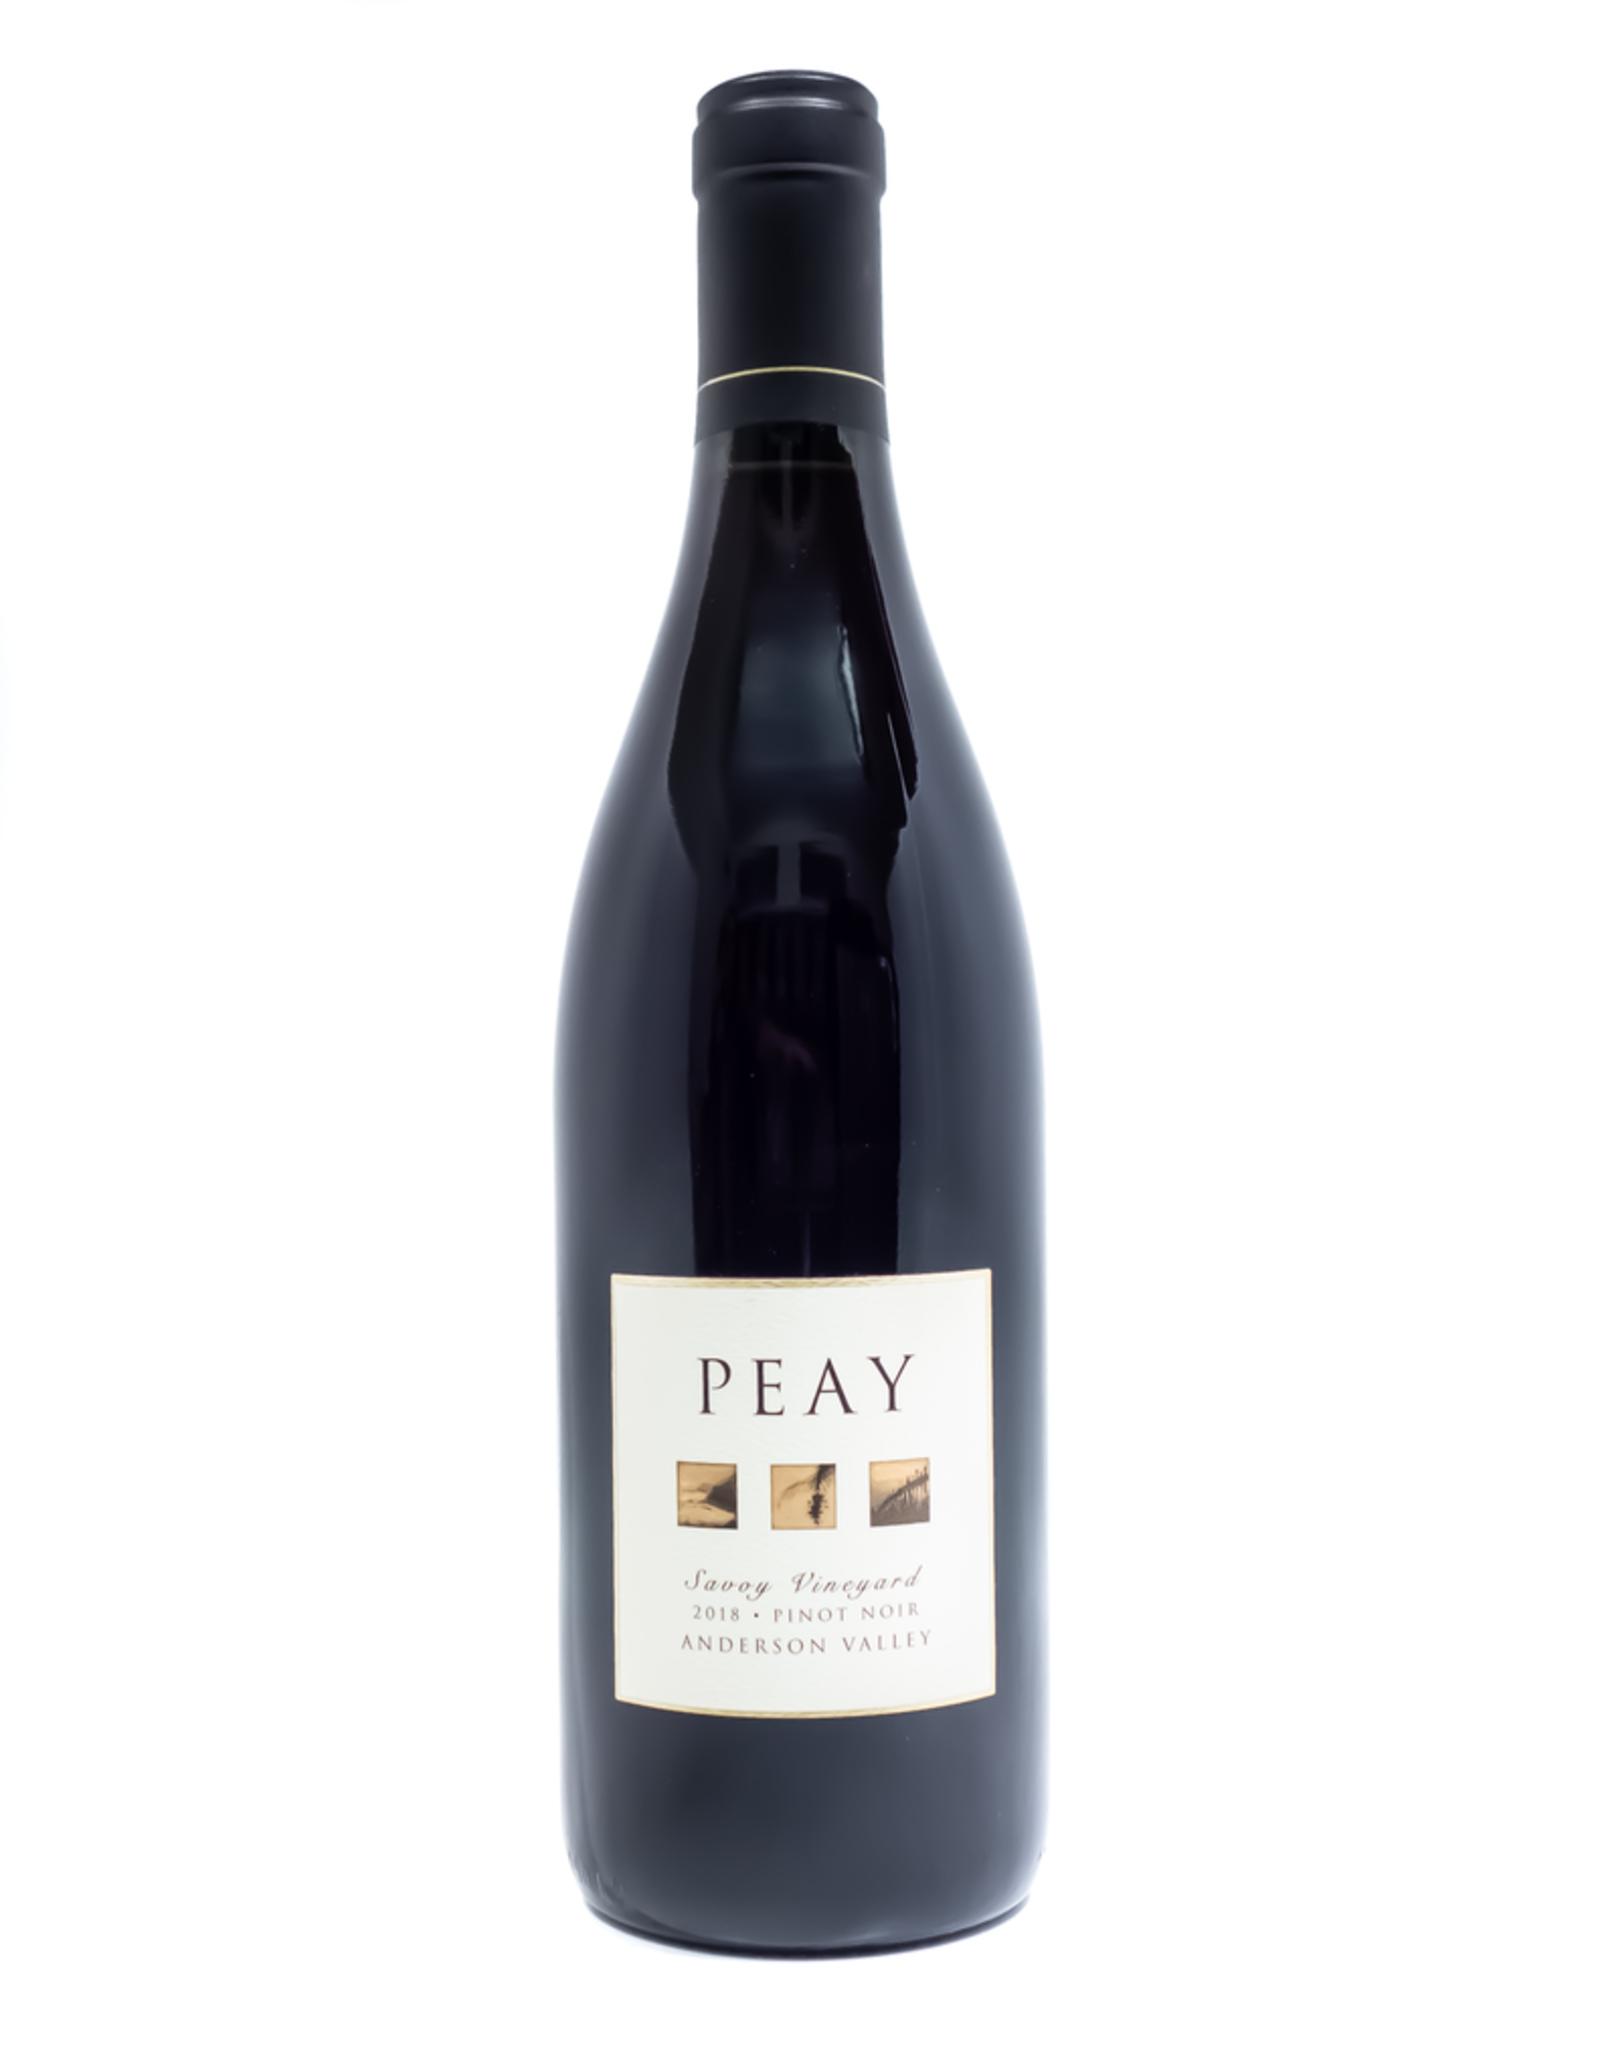 Wine-Red-Lush Peay Vineyards Pinot Noir Savoy Vineyard Anderson Valley 2018